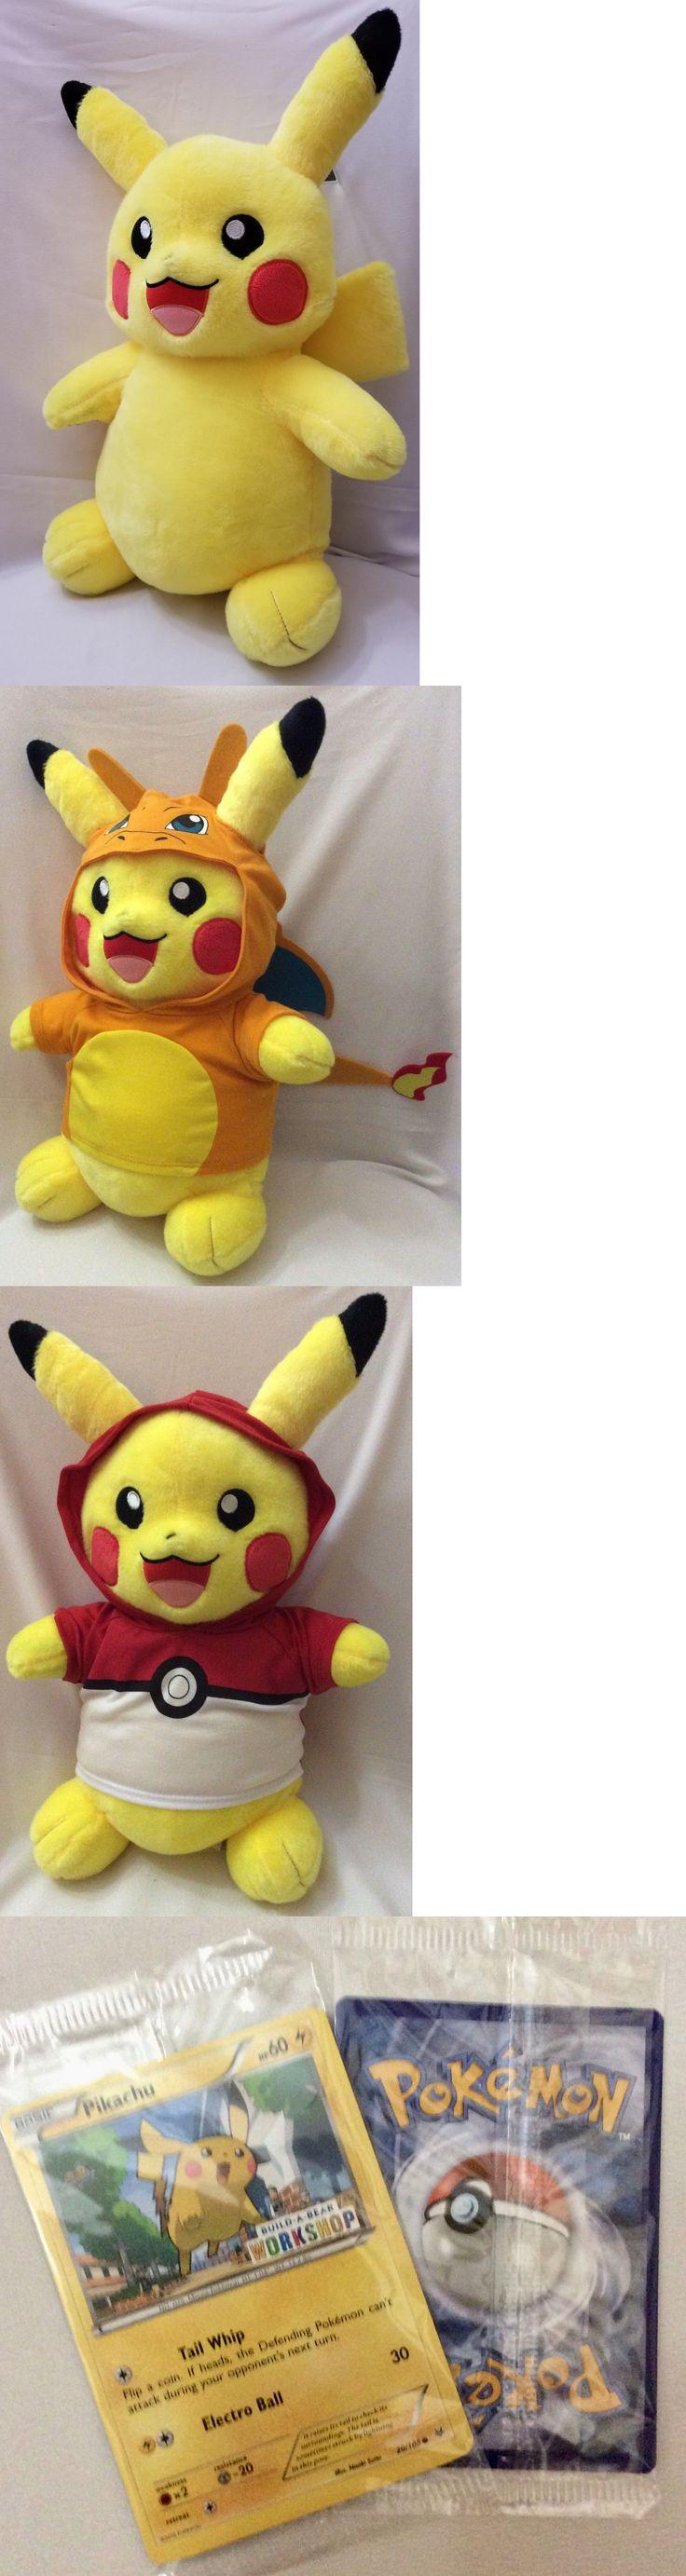 Pok mon 1524: Build A Bear Pokemon Pikachu W Sound, Babw Exclusive Pokemon Tcg Card And More! -> BUY IT NOW ONLY: $49.99 on eBay!